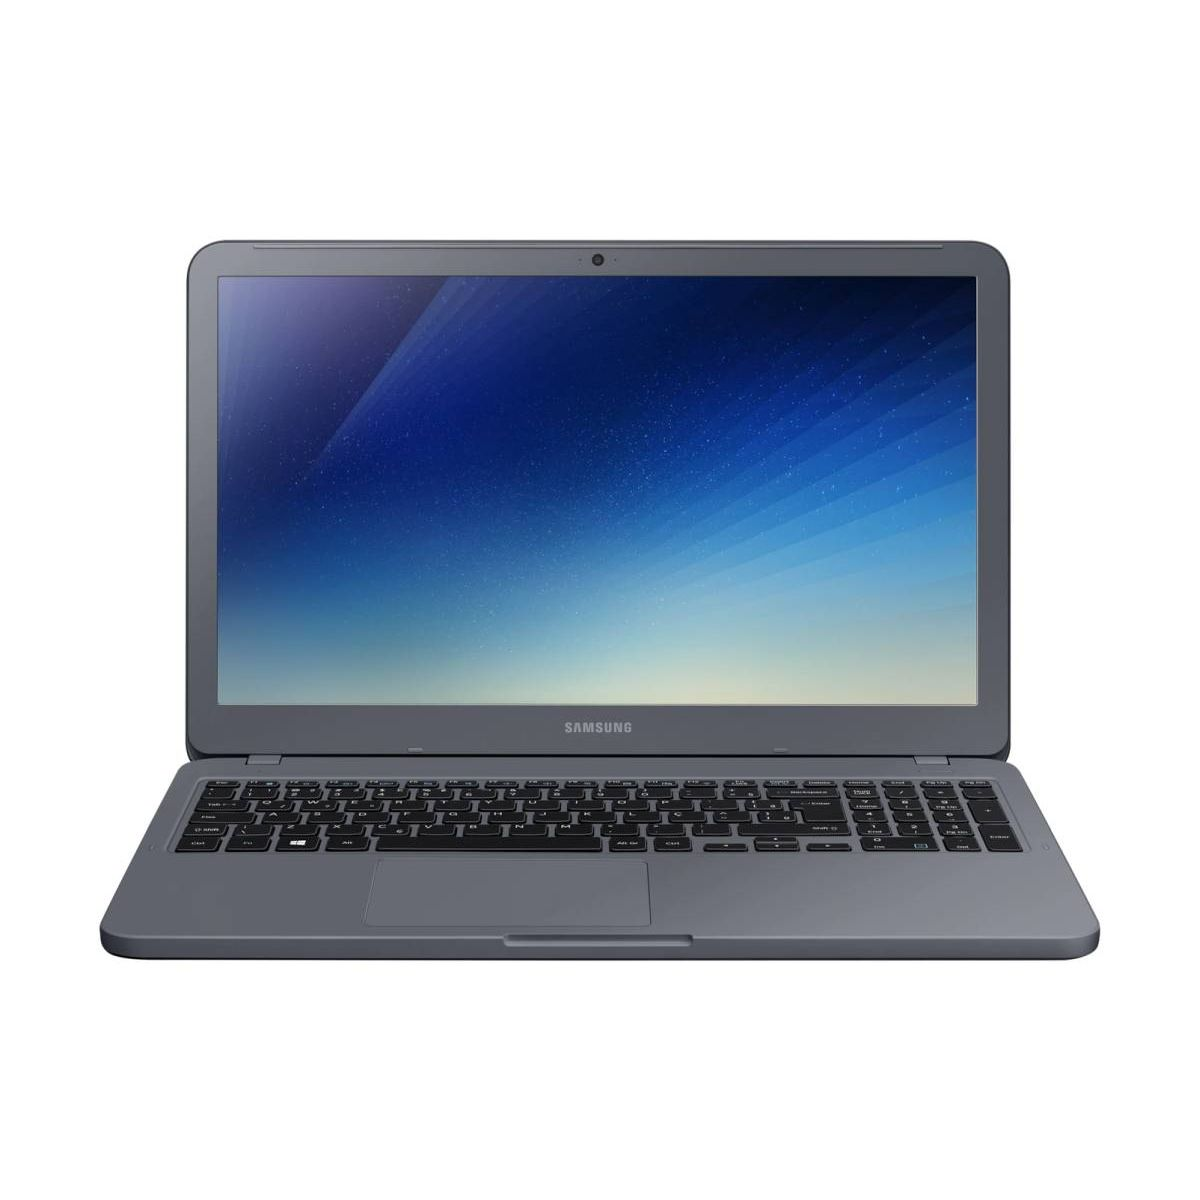 "Notebook - Samsung Np350xbe-xd1br I5-8265u 1.60ghz 8gb 1tb Padrão Geforce Mx110 Windows 10 Home Expert X40 15,6"" Polegadas"